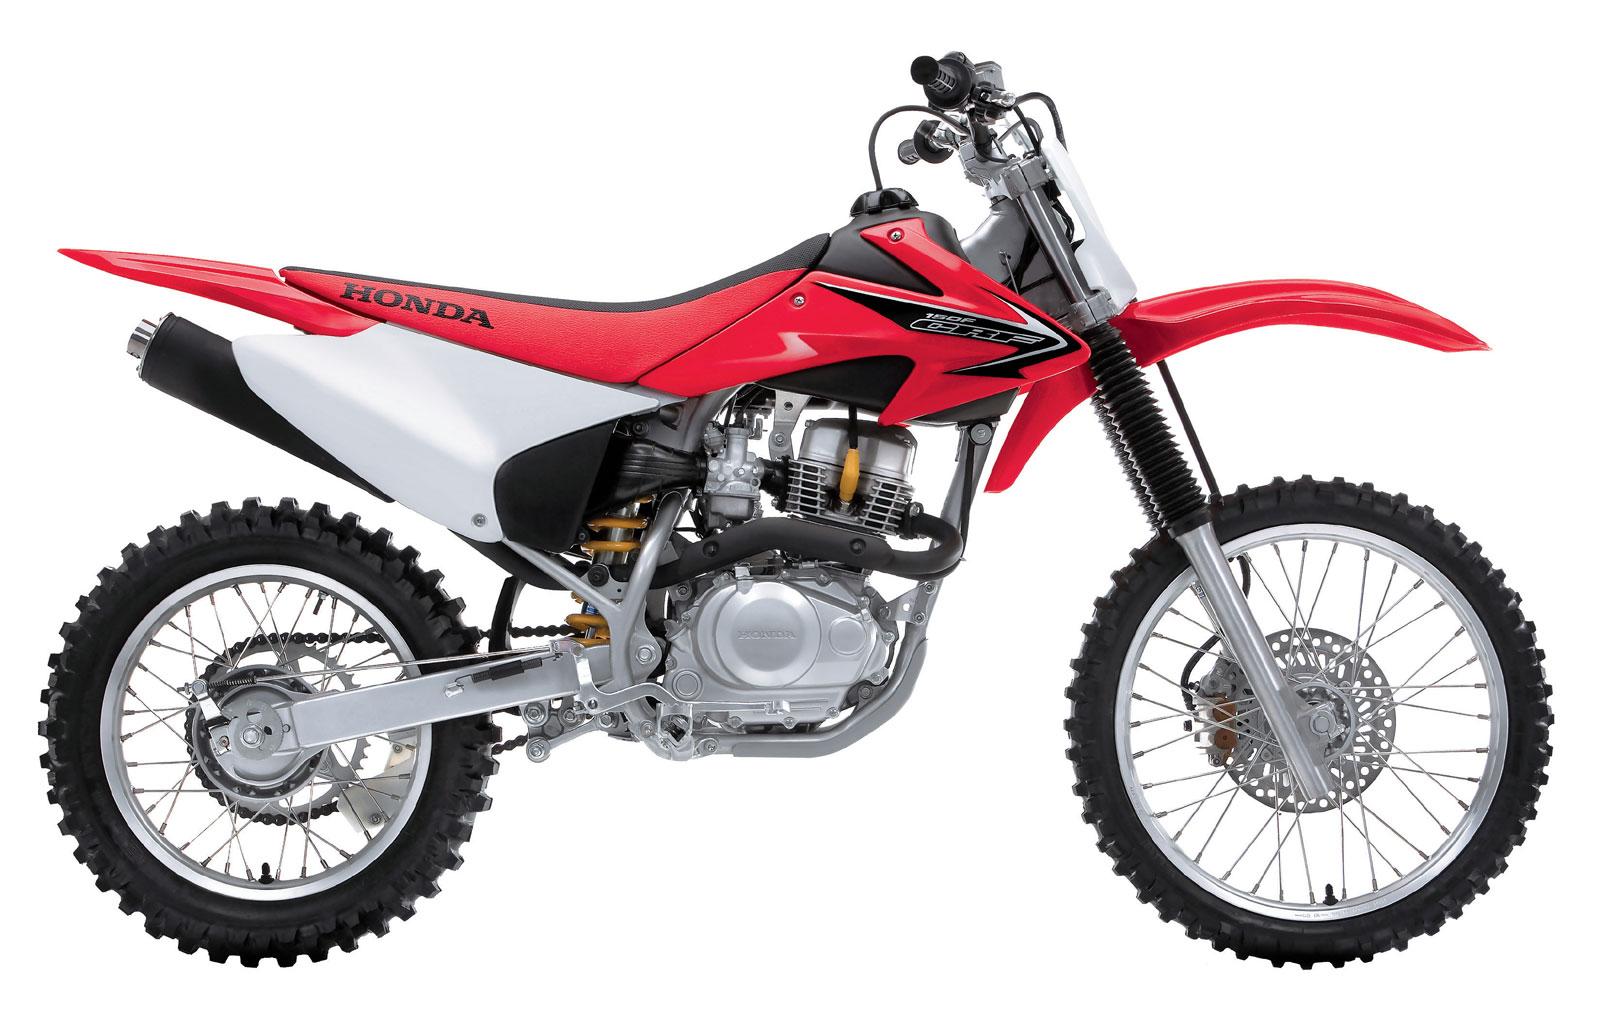 Spesifikasi dan harga motor honda crf 150cc dan 250 baru for South motors honda us1